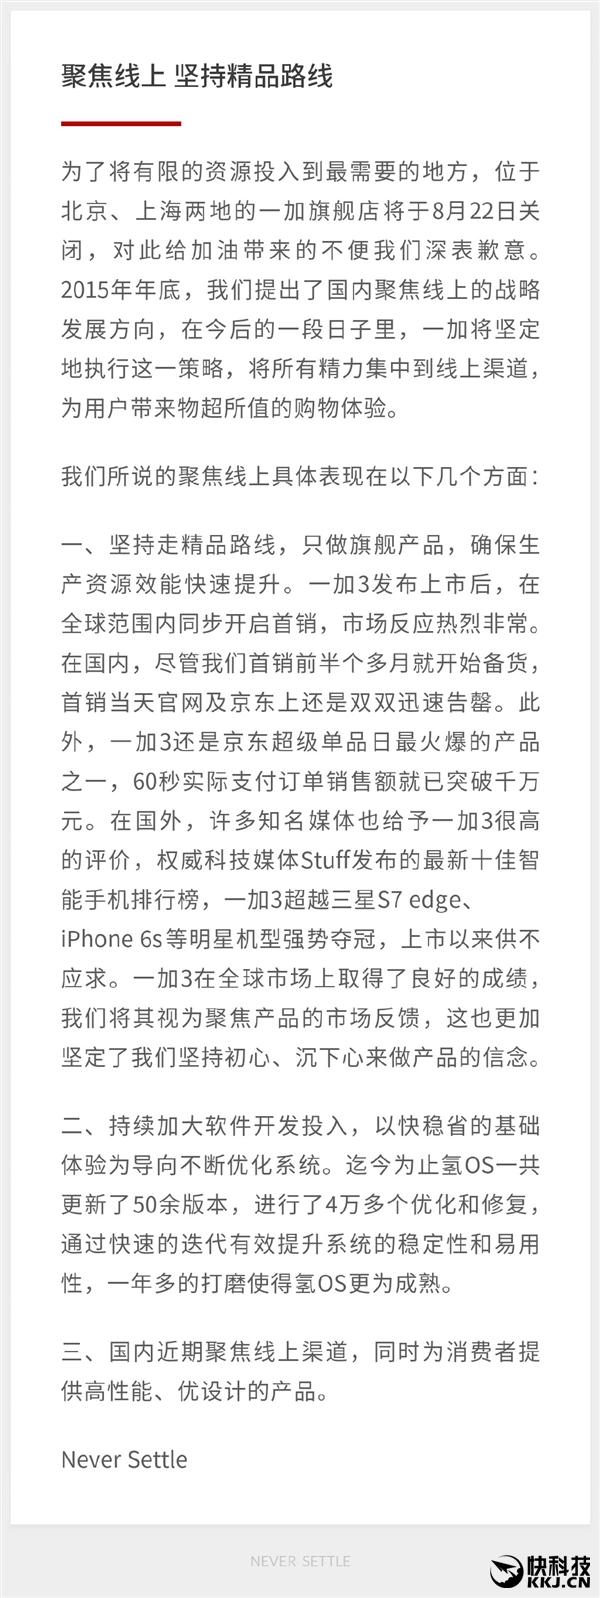 OnePlus-cierra-tiendas-fisicas